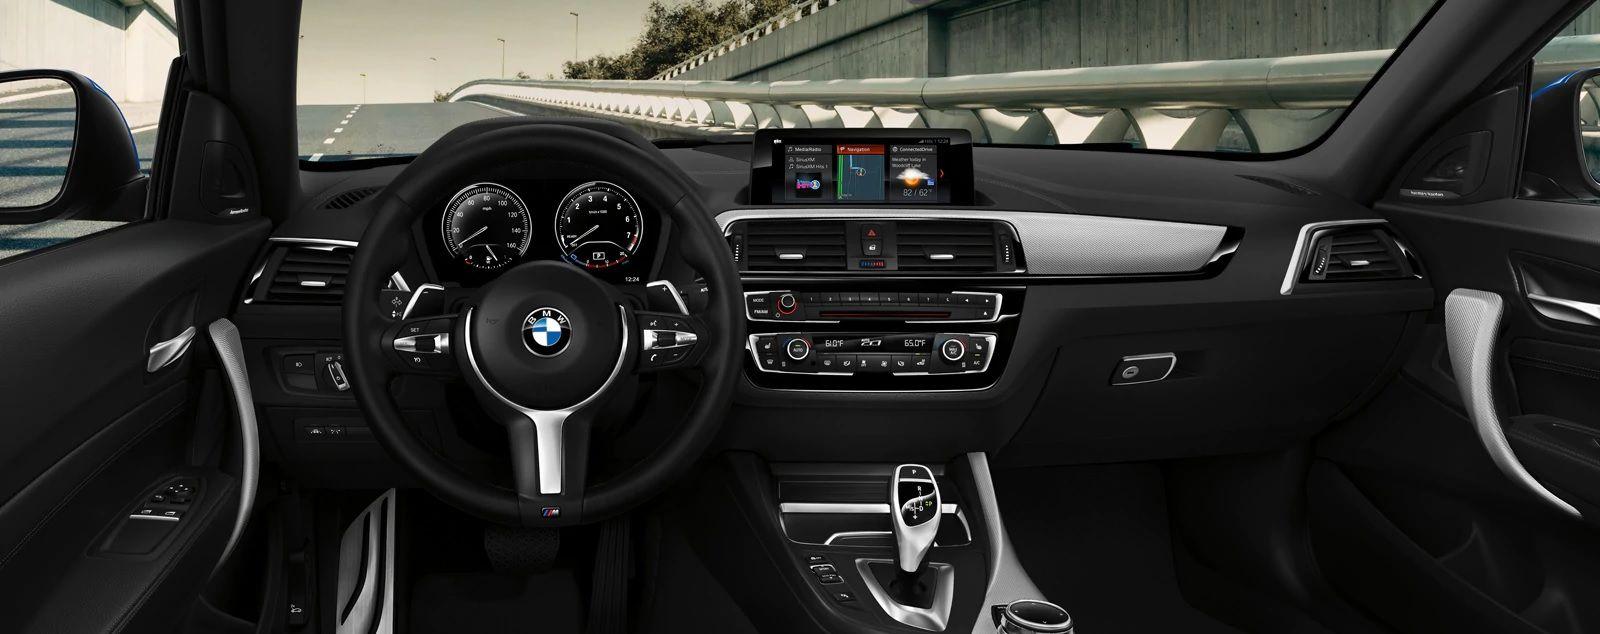 2020 BMW 2 Series Center Stack